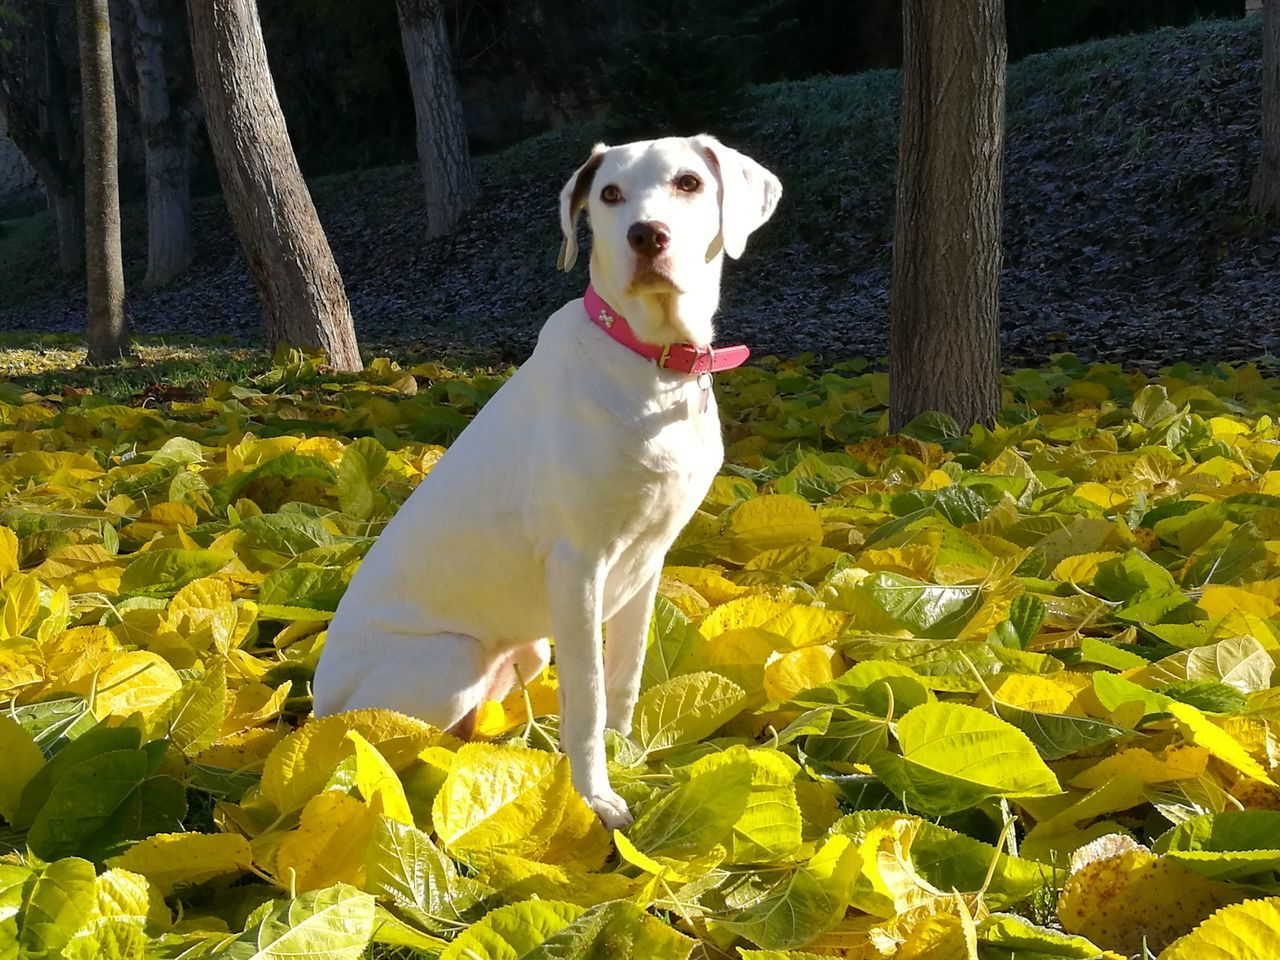 Pets One Animal Dog Domestic Animals Animal Themes Dog❤ Mejor Amigo Por Y Para Siempre. Loveanimals❤️ Perros❤ Nature Beauty In Nature Belleza Animal Sin Filtros HuaweiP9